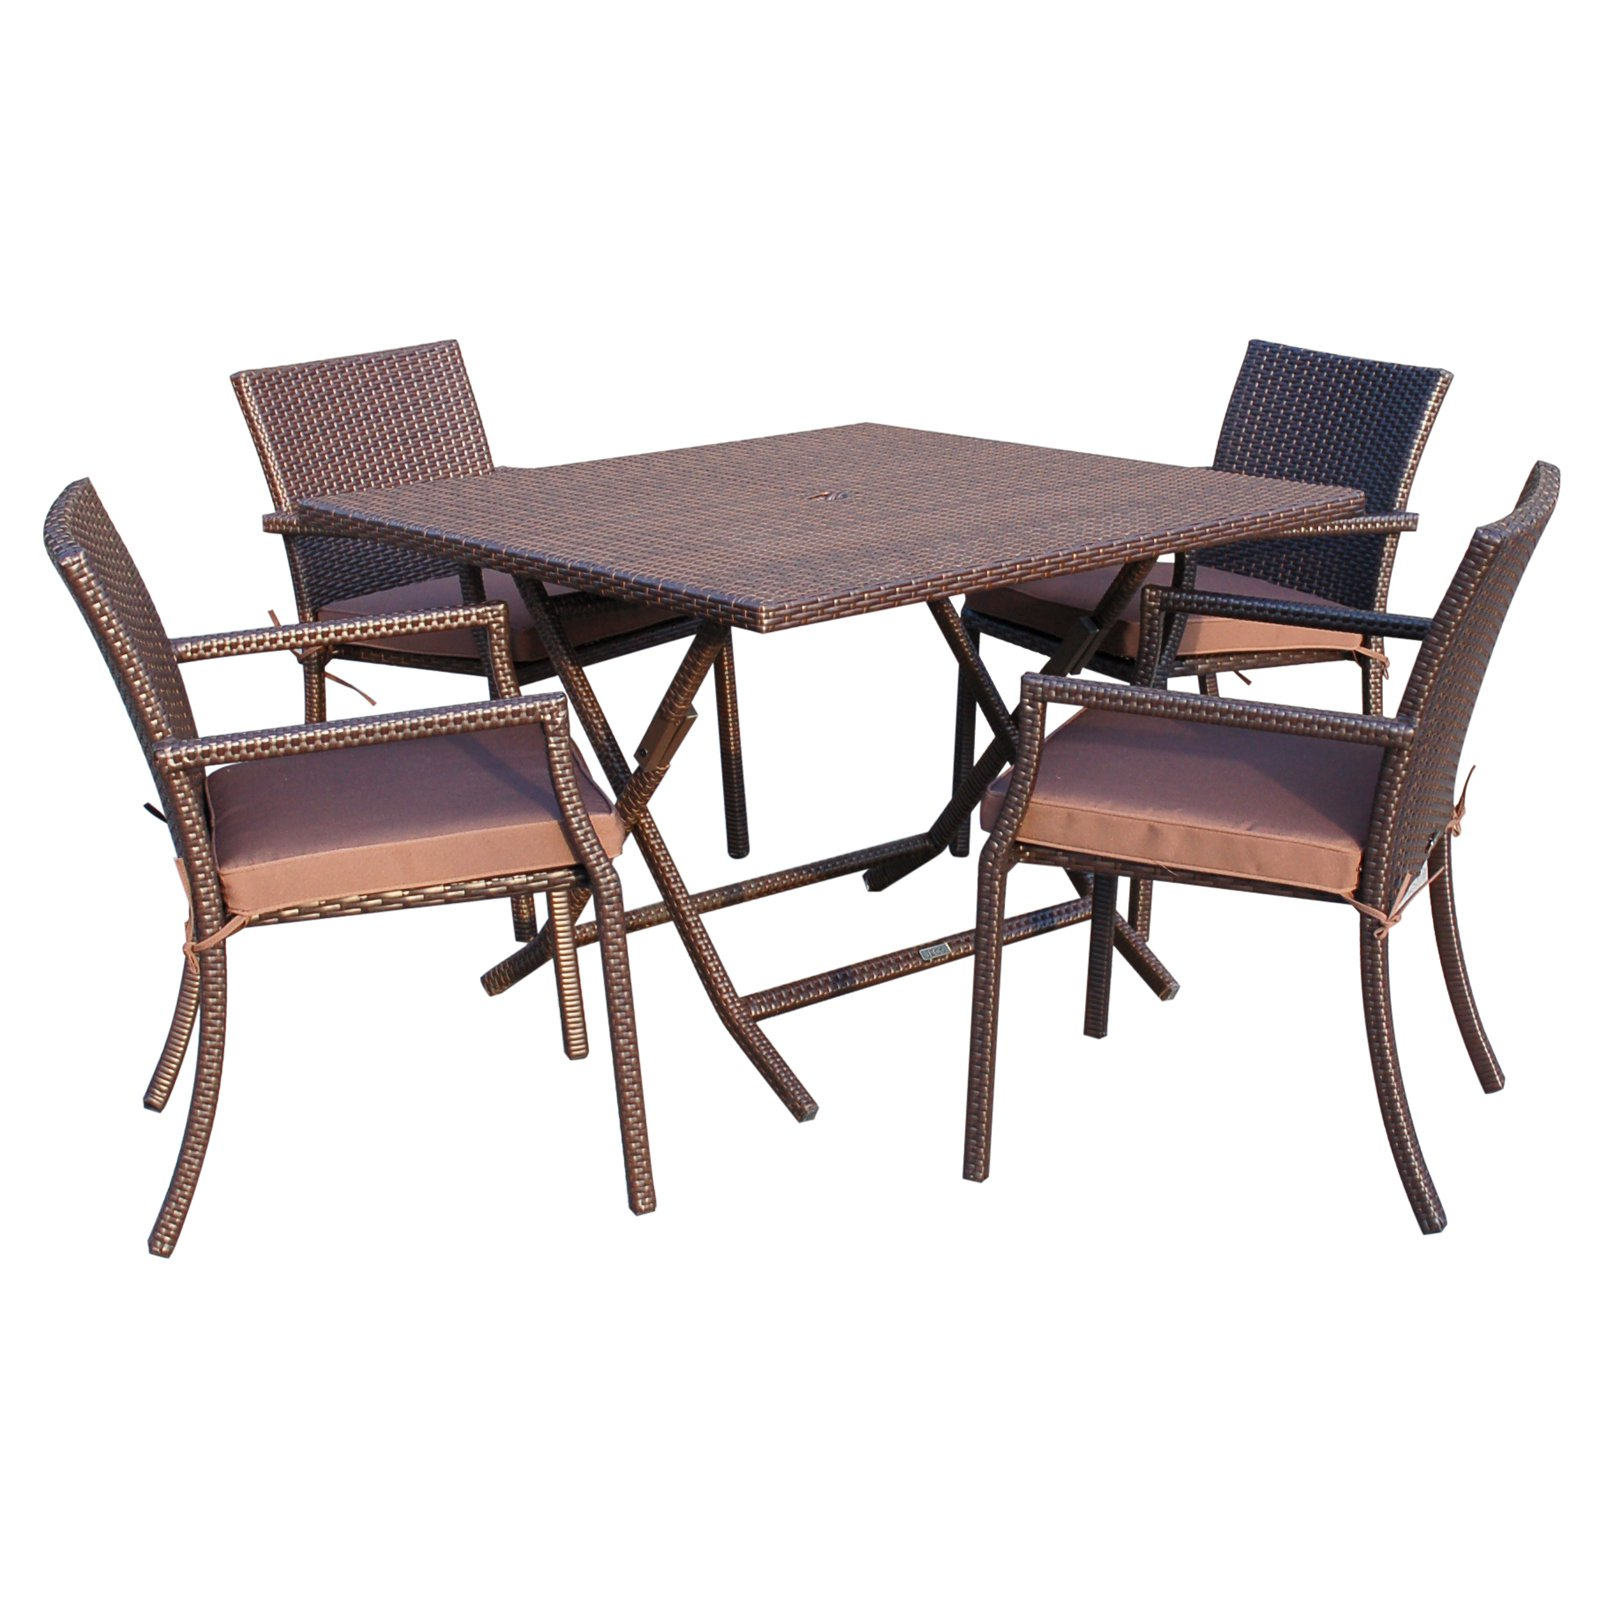 Jeco Cafe Wicker 5-Piece Square Patio Dining Set